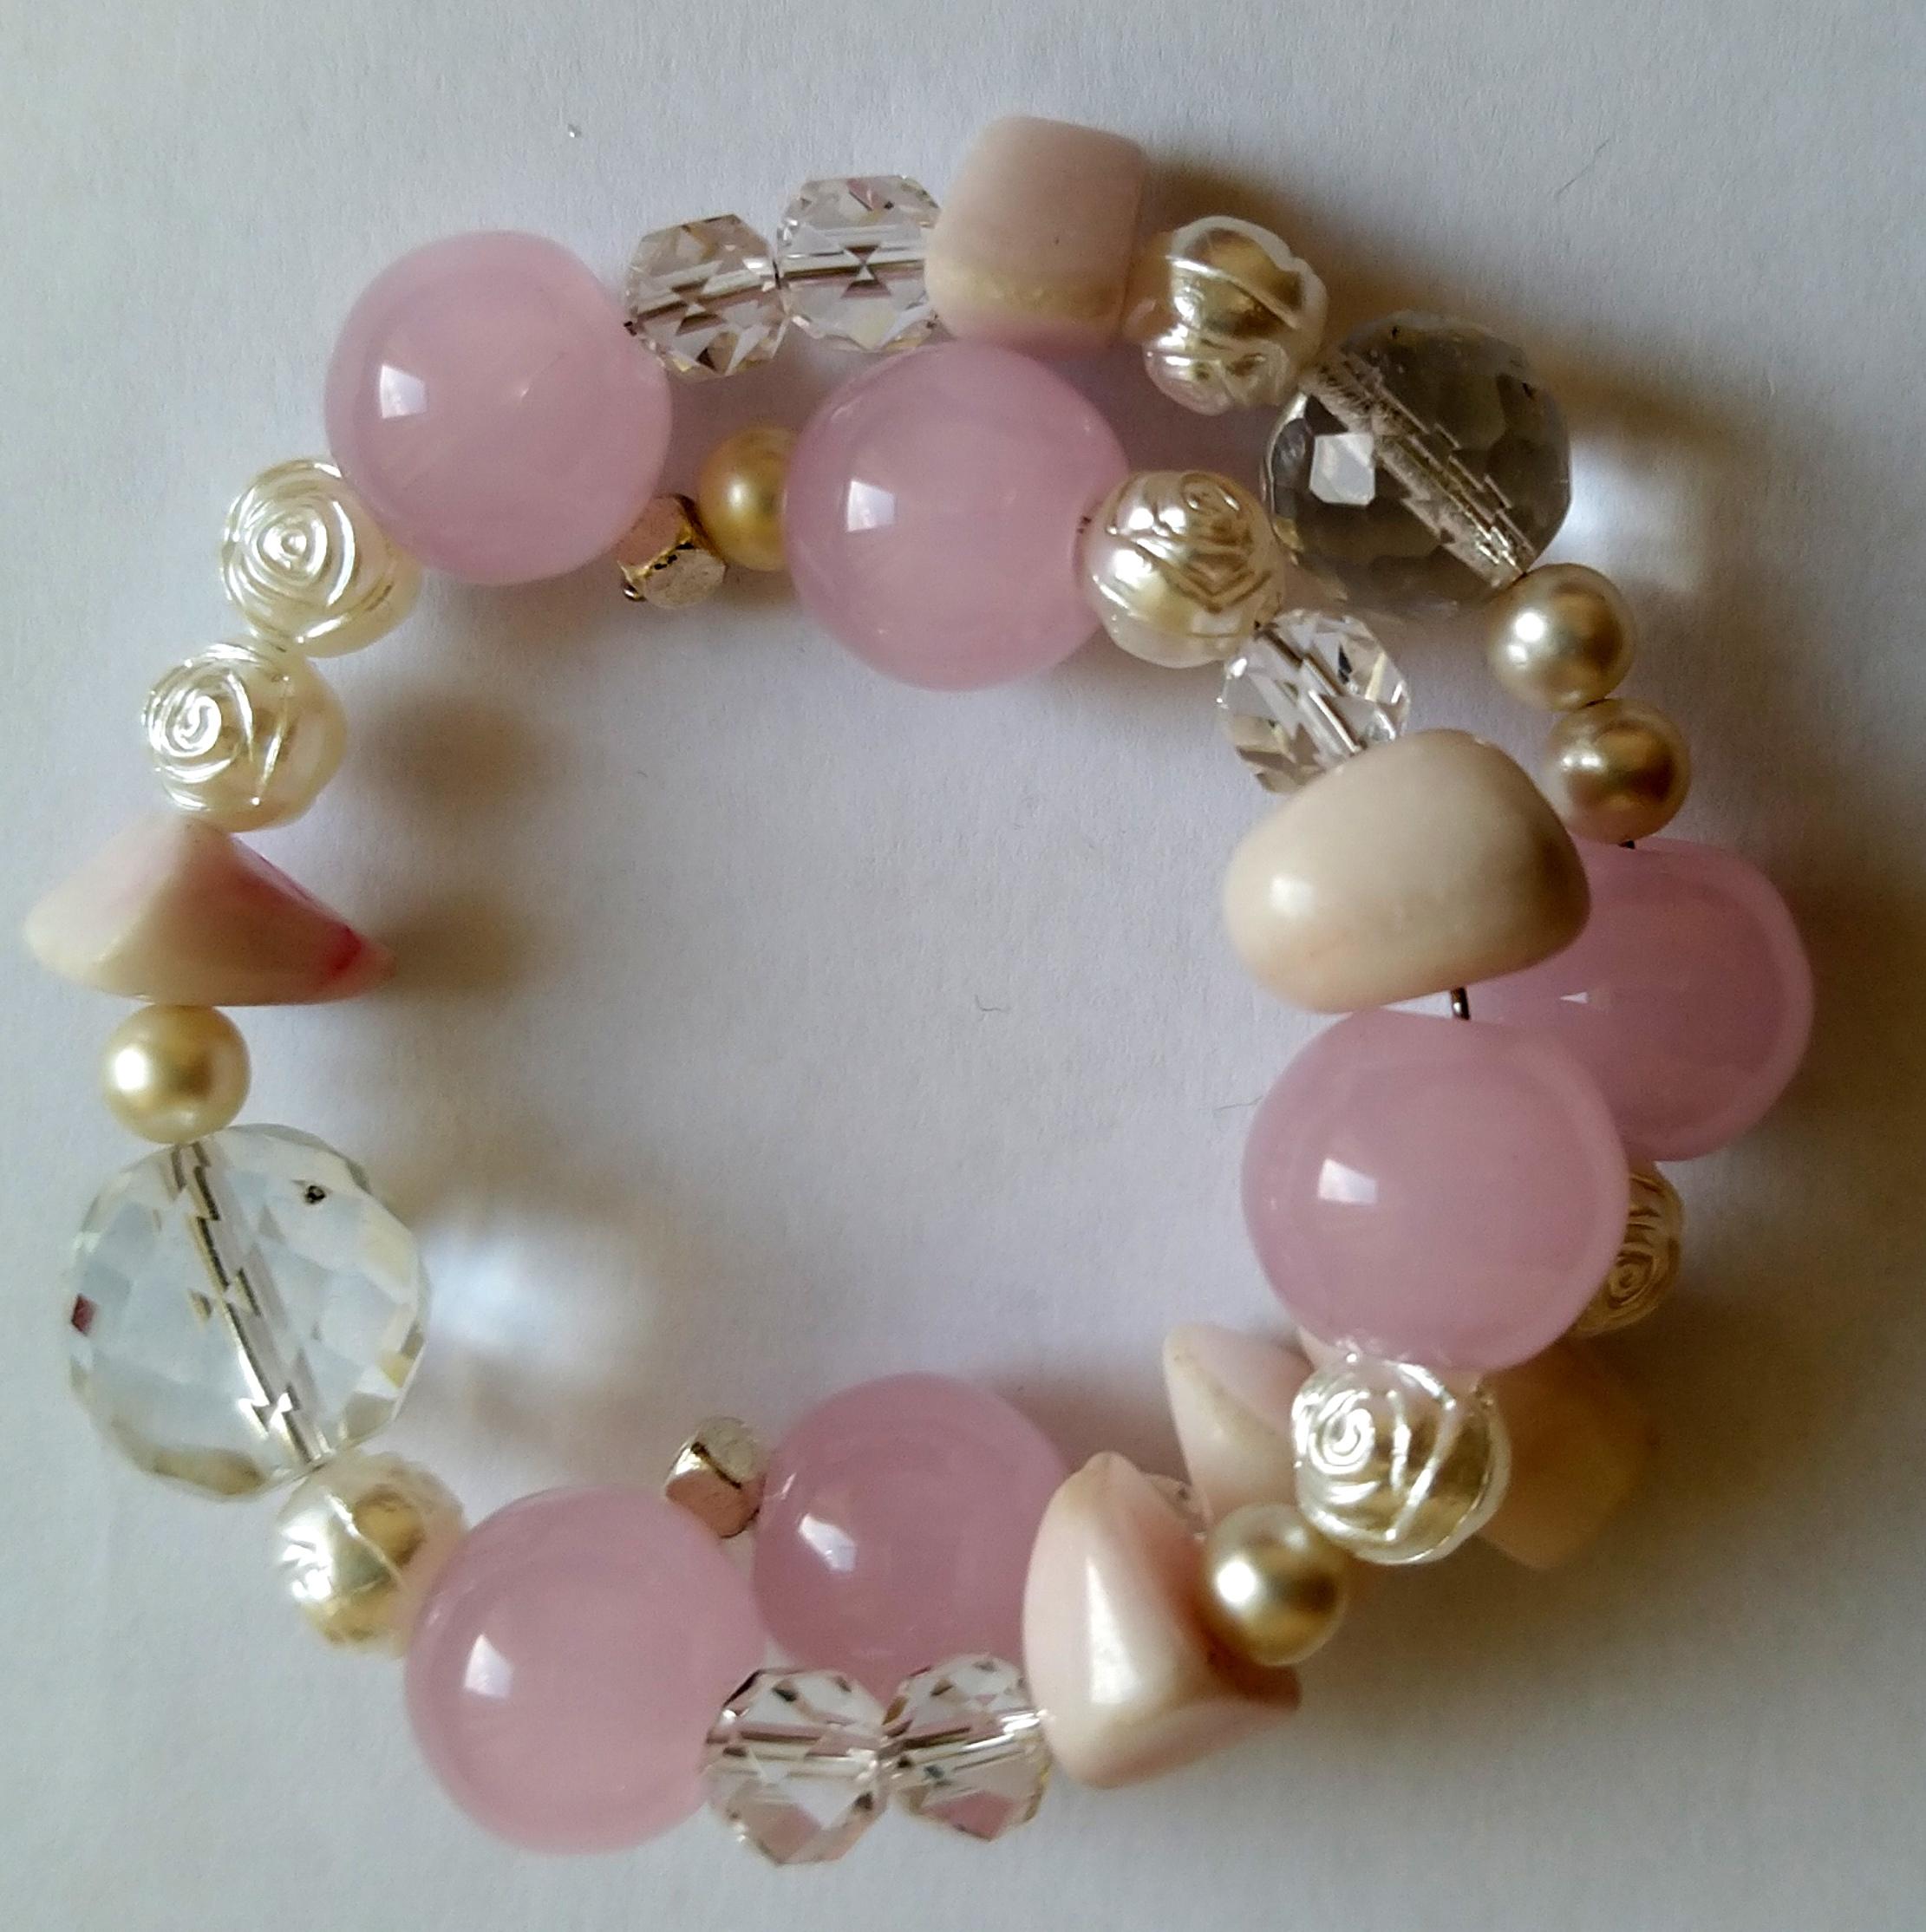 #FP-B 190807 Bracelet  Suggested $25 USD